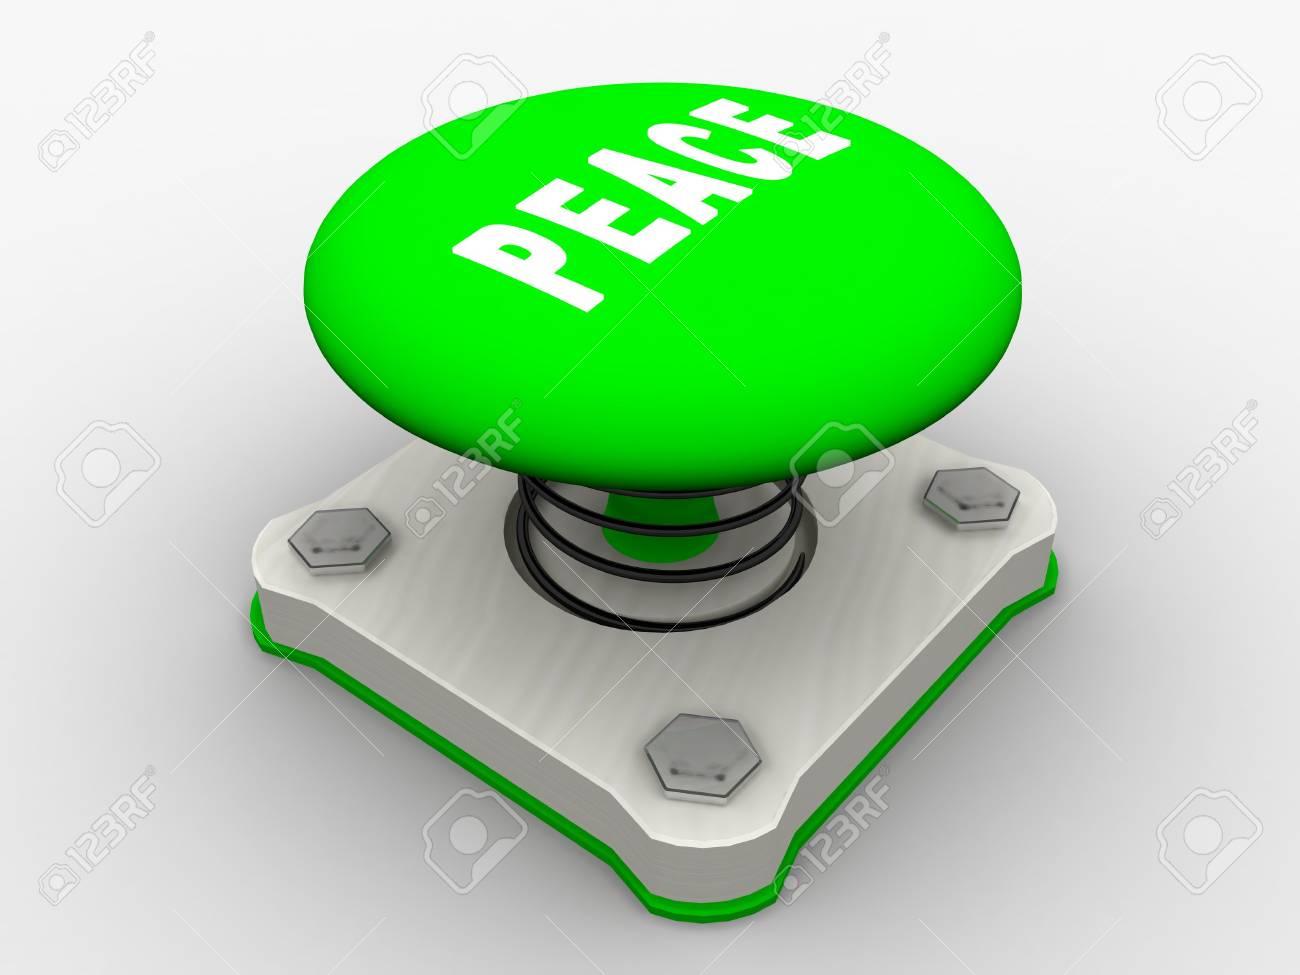 Green start button on a metal platform Stock Photo - 5338621